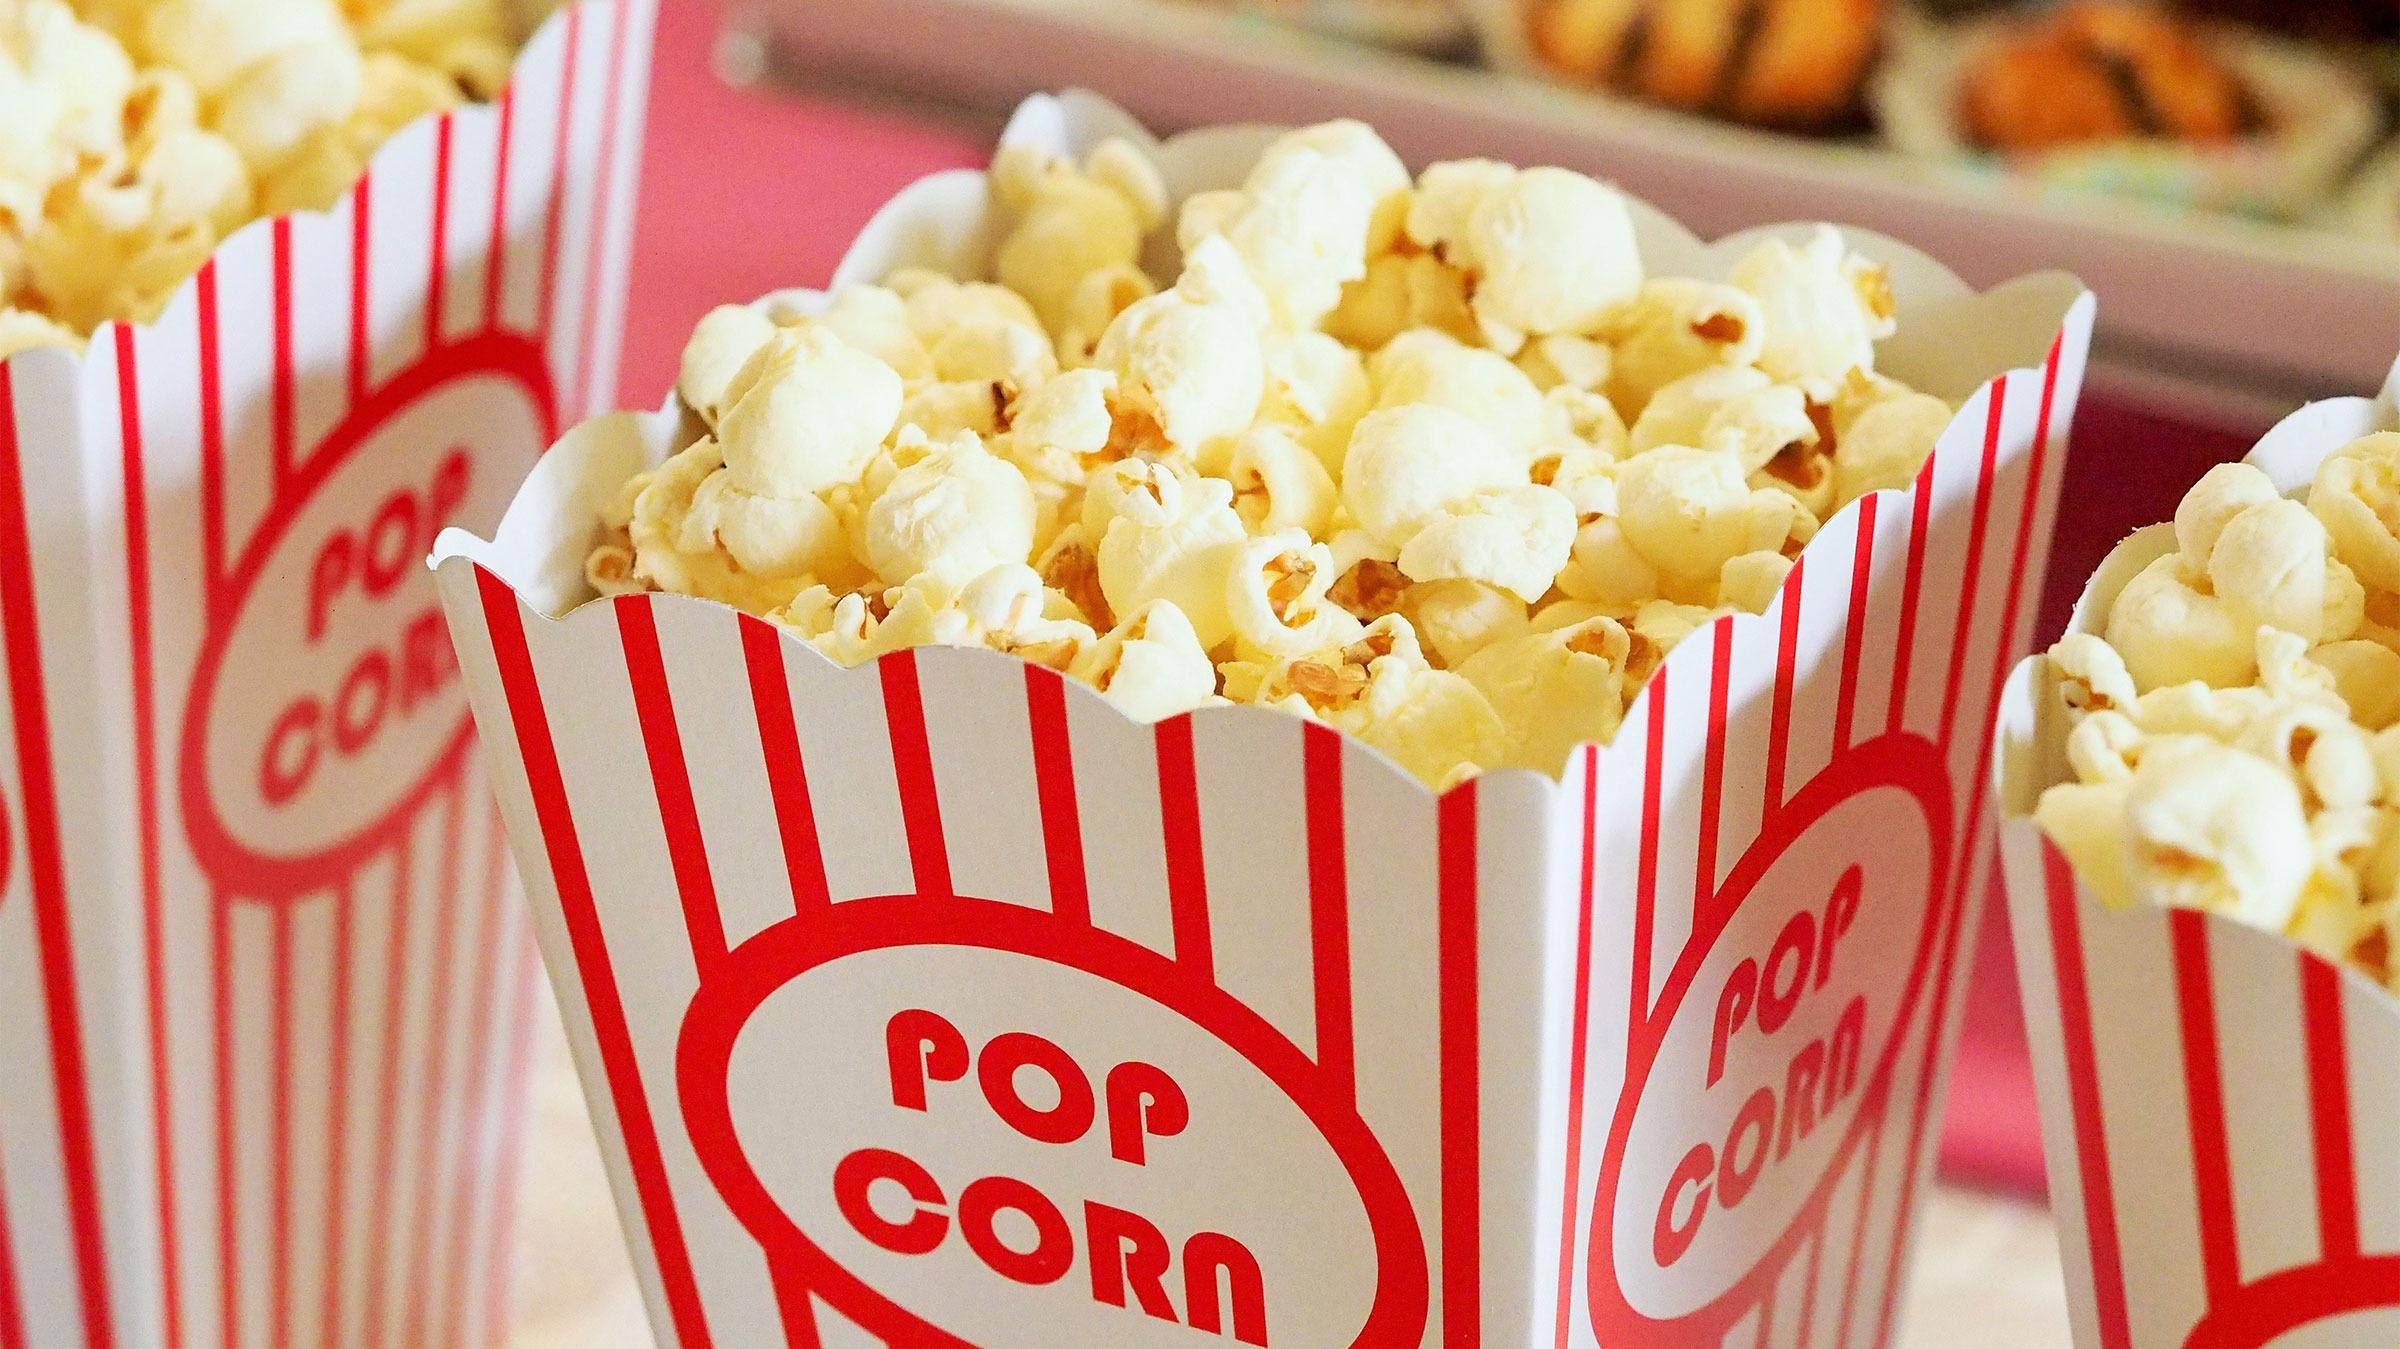 Joe popcorn